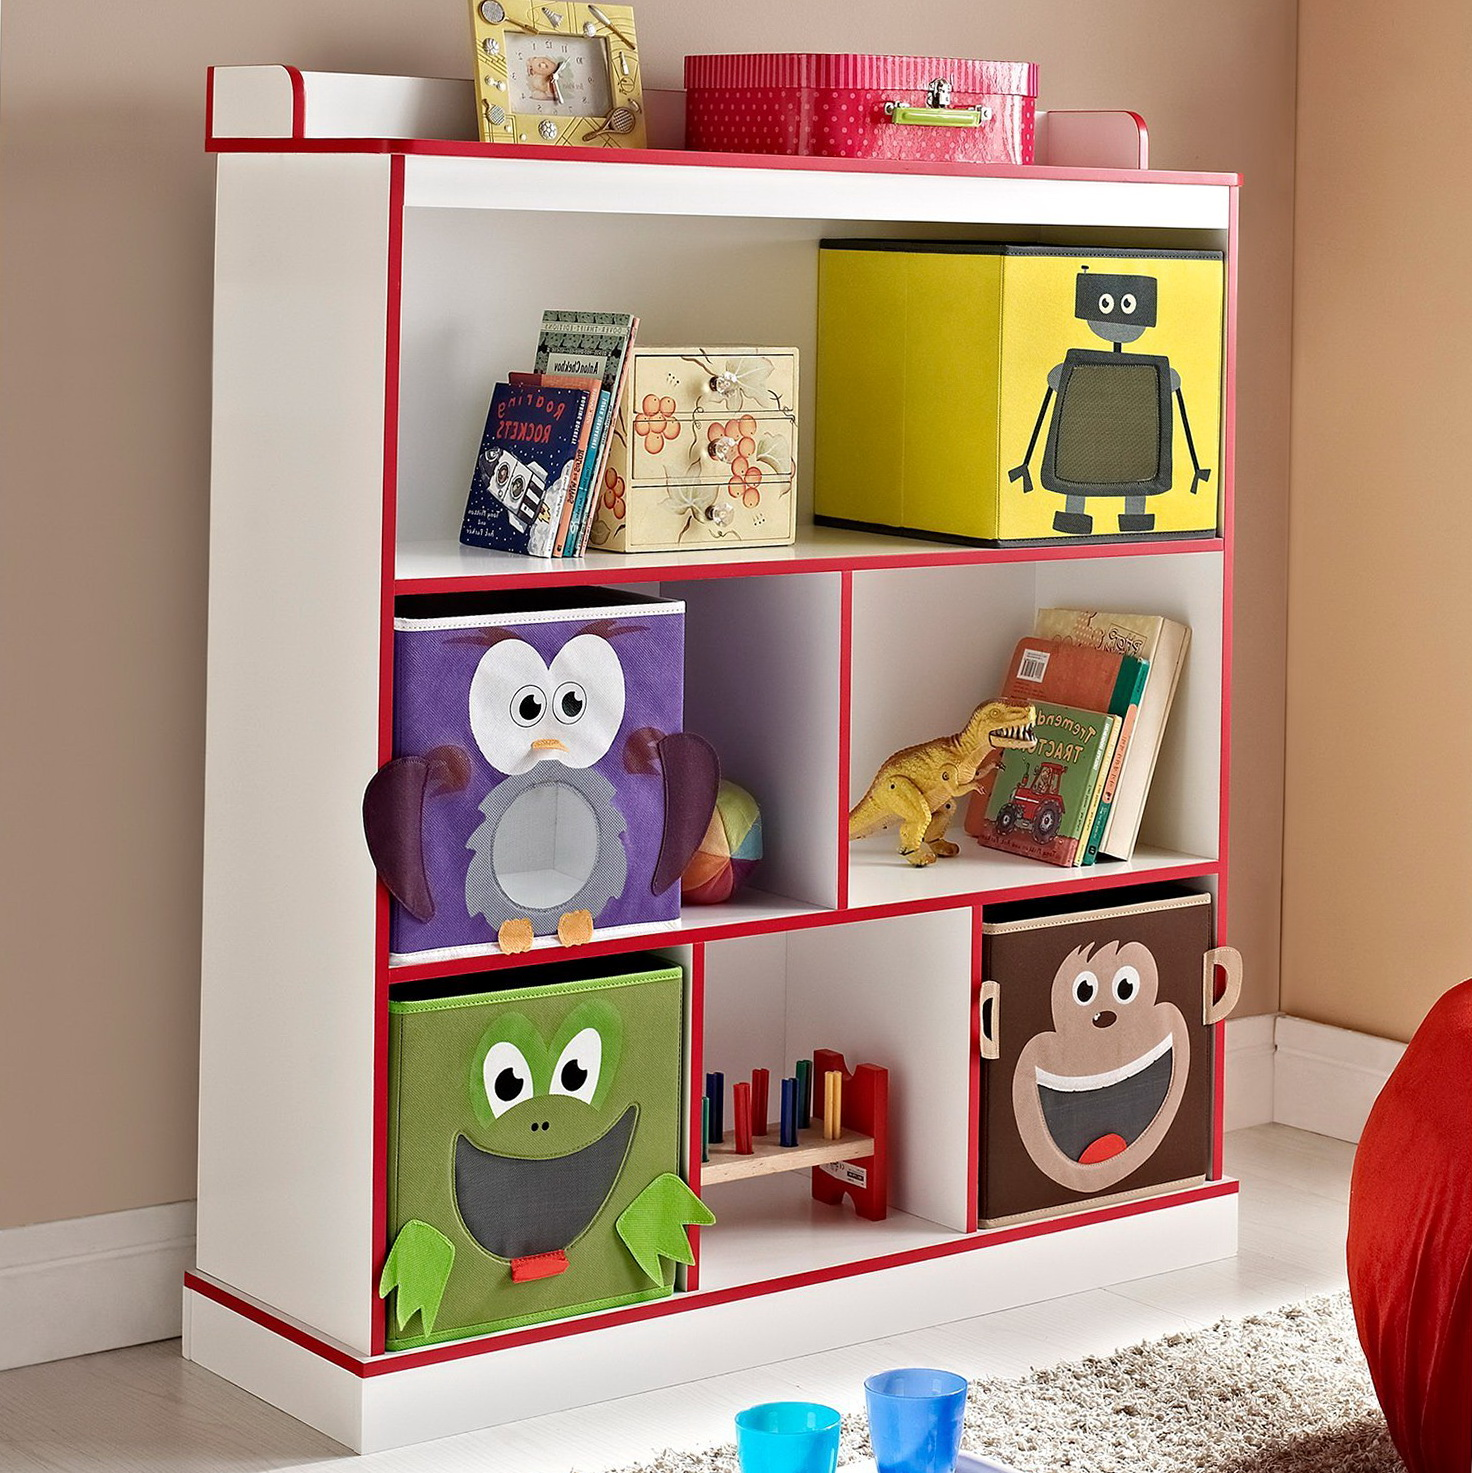 Permalink to How To Make A Bookshelf For Kids